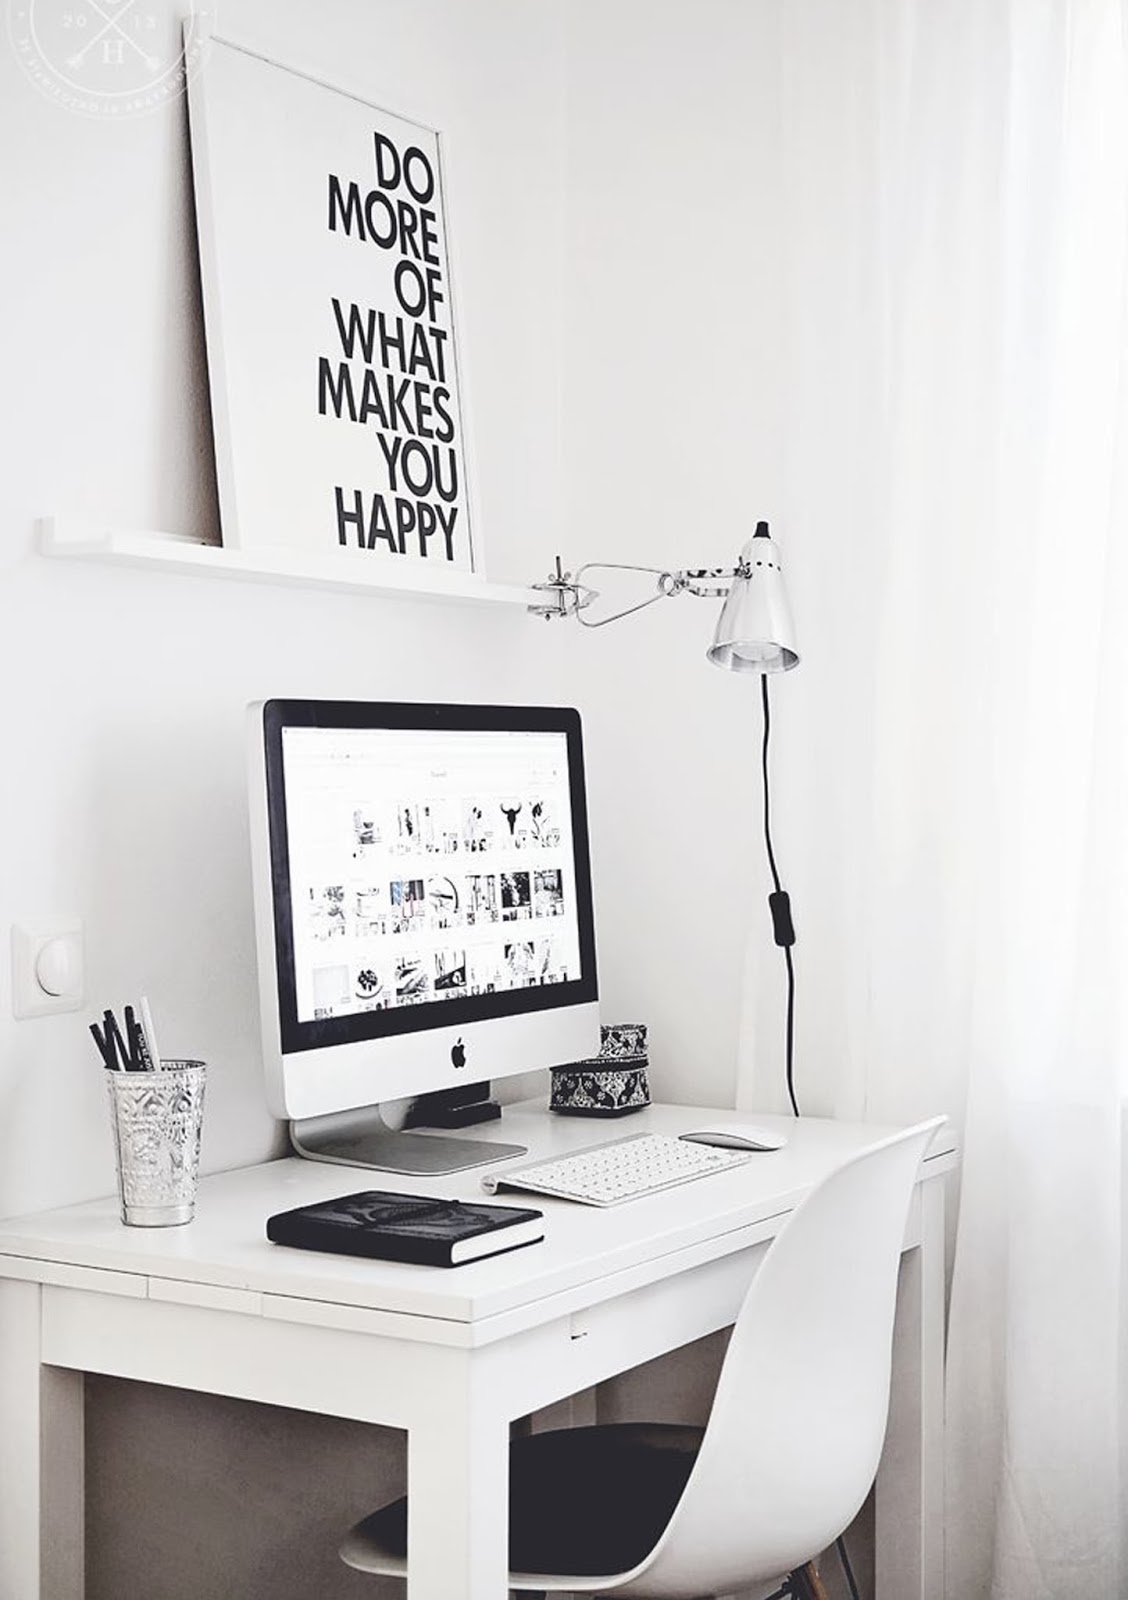 Workspaces, scandinavian, скандинавский интерьер, рабочее место, рабочий стол